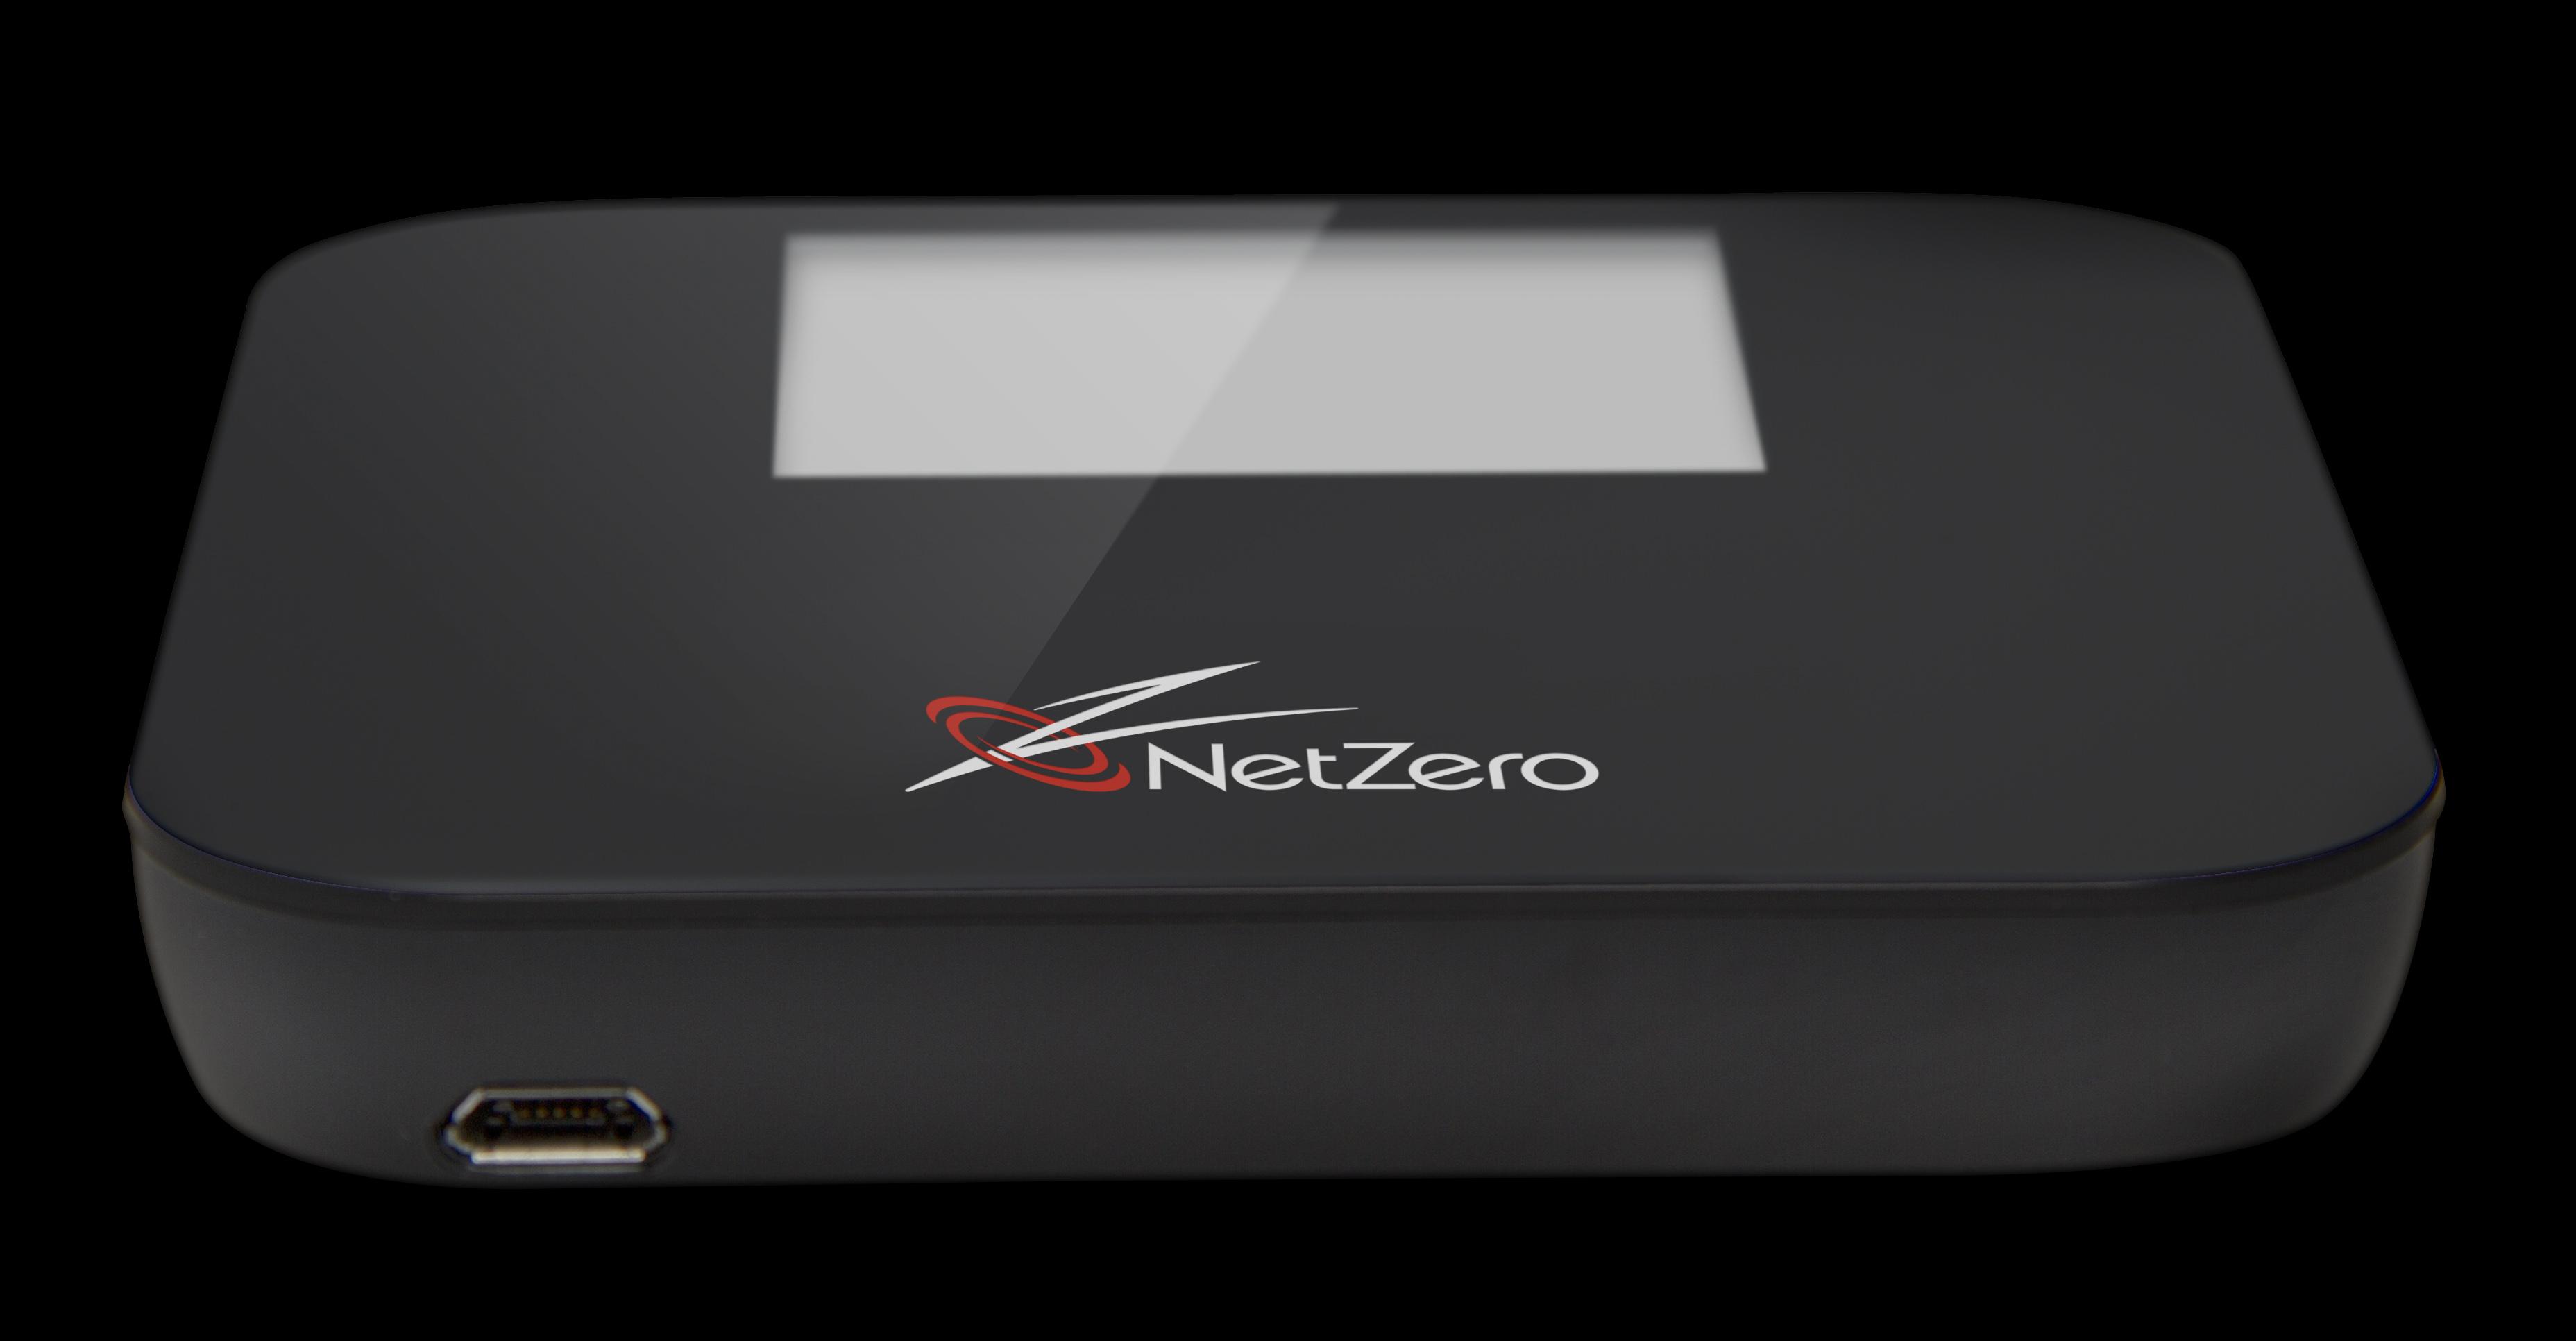 Netzero 4g mobile hotspot provides secure fast internet for Netzero met